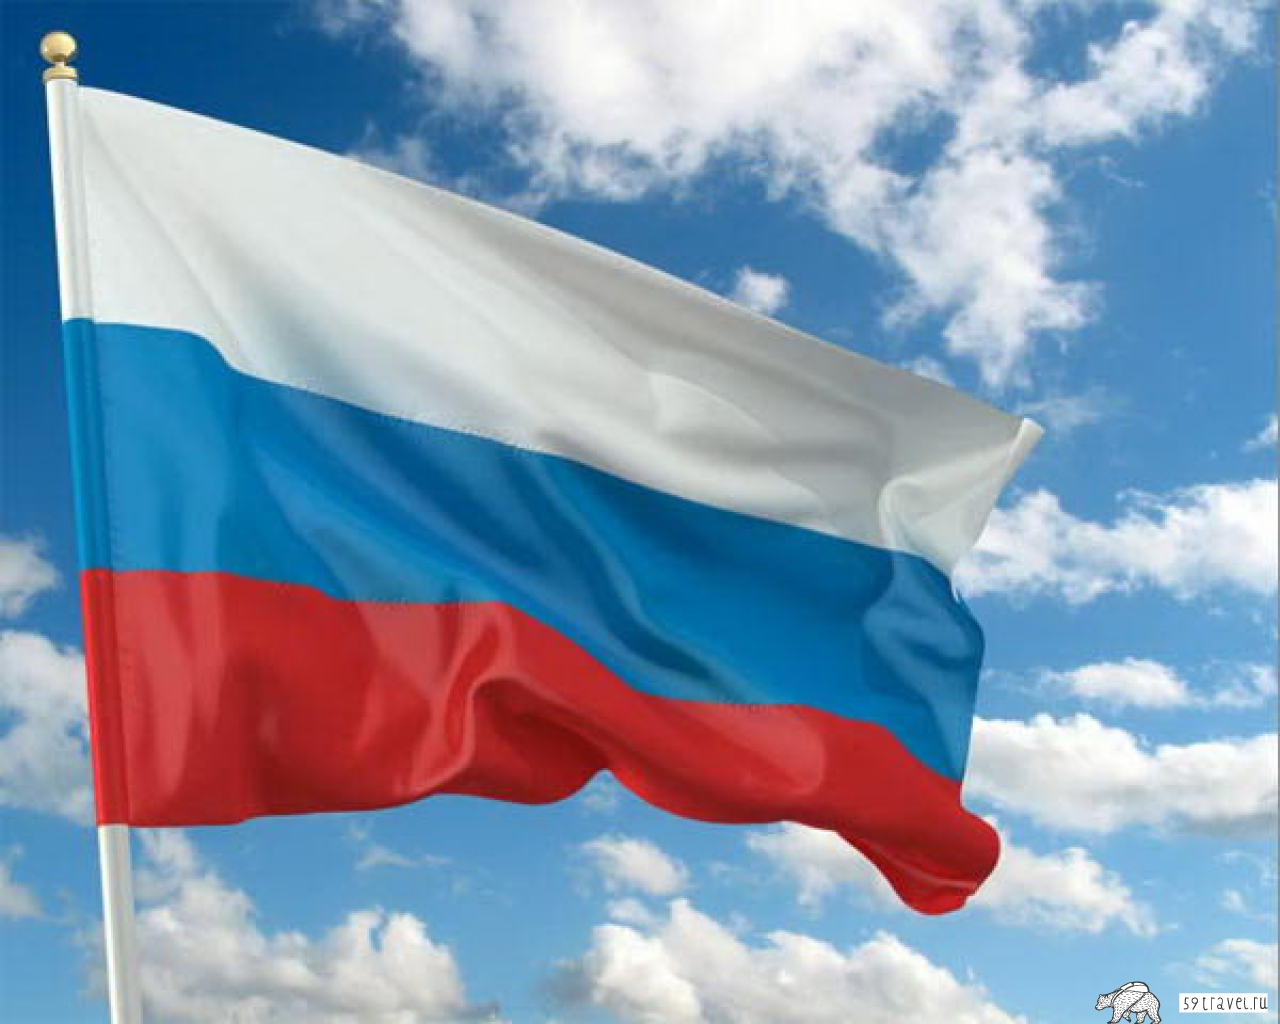 Продажа флагов РФ производится любым ...: www.profflag.ru